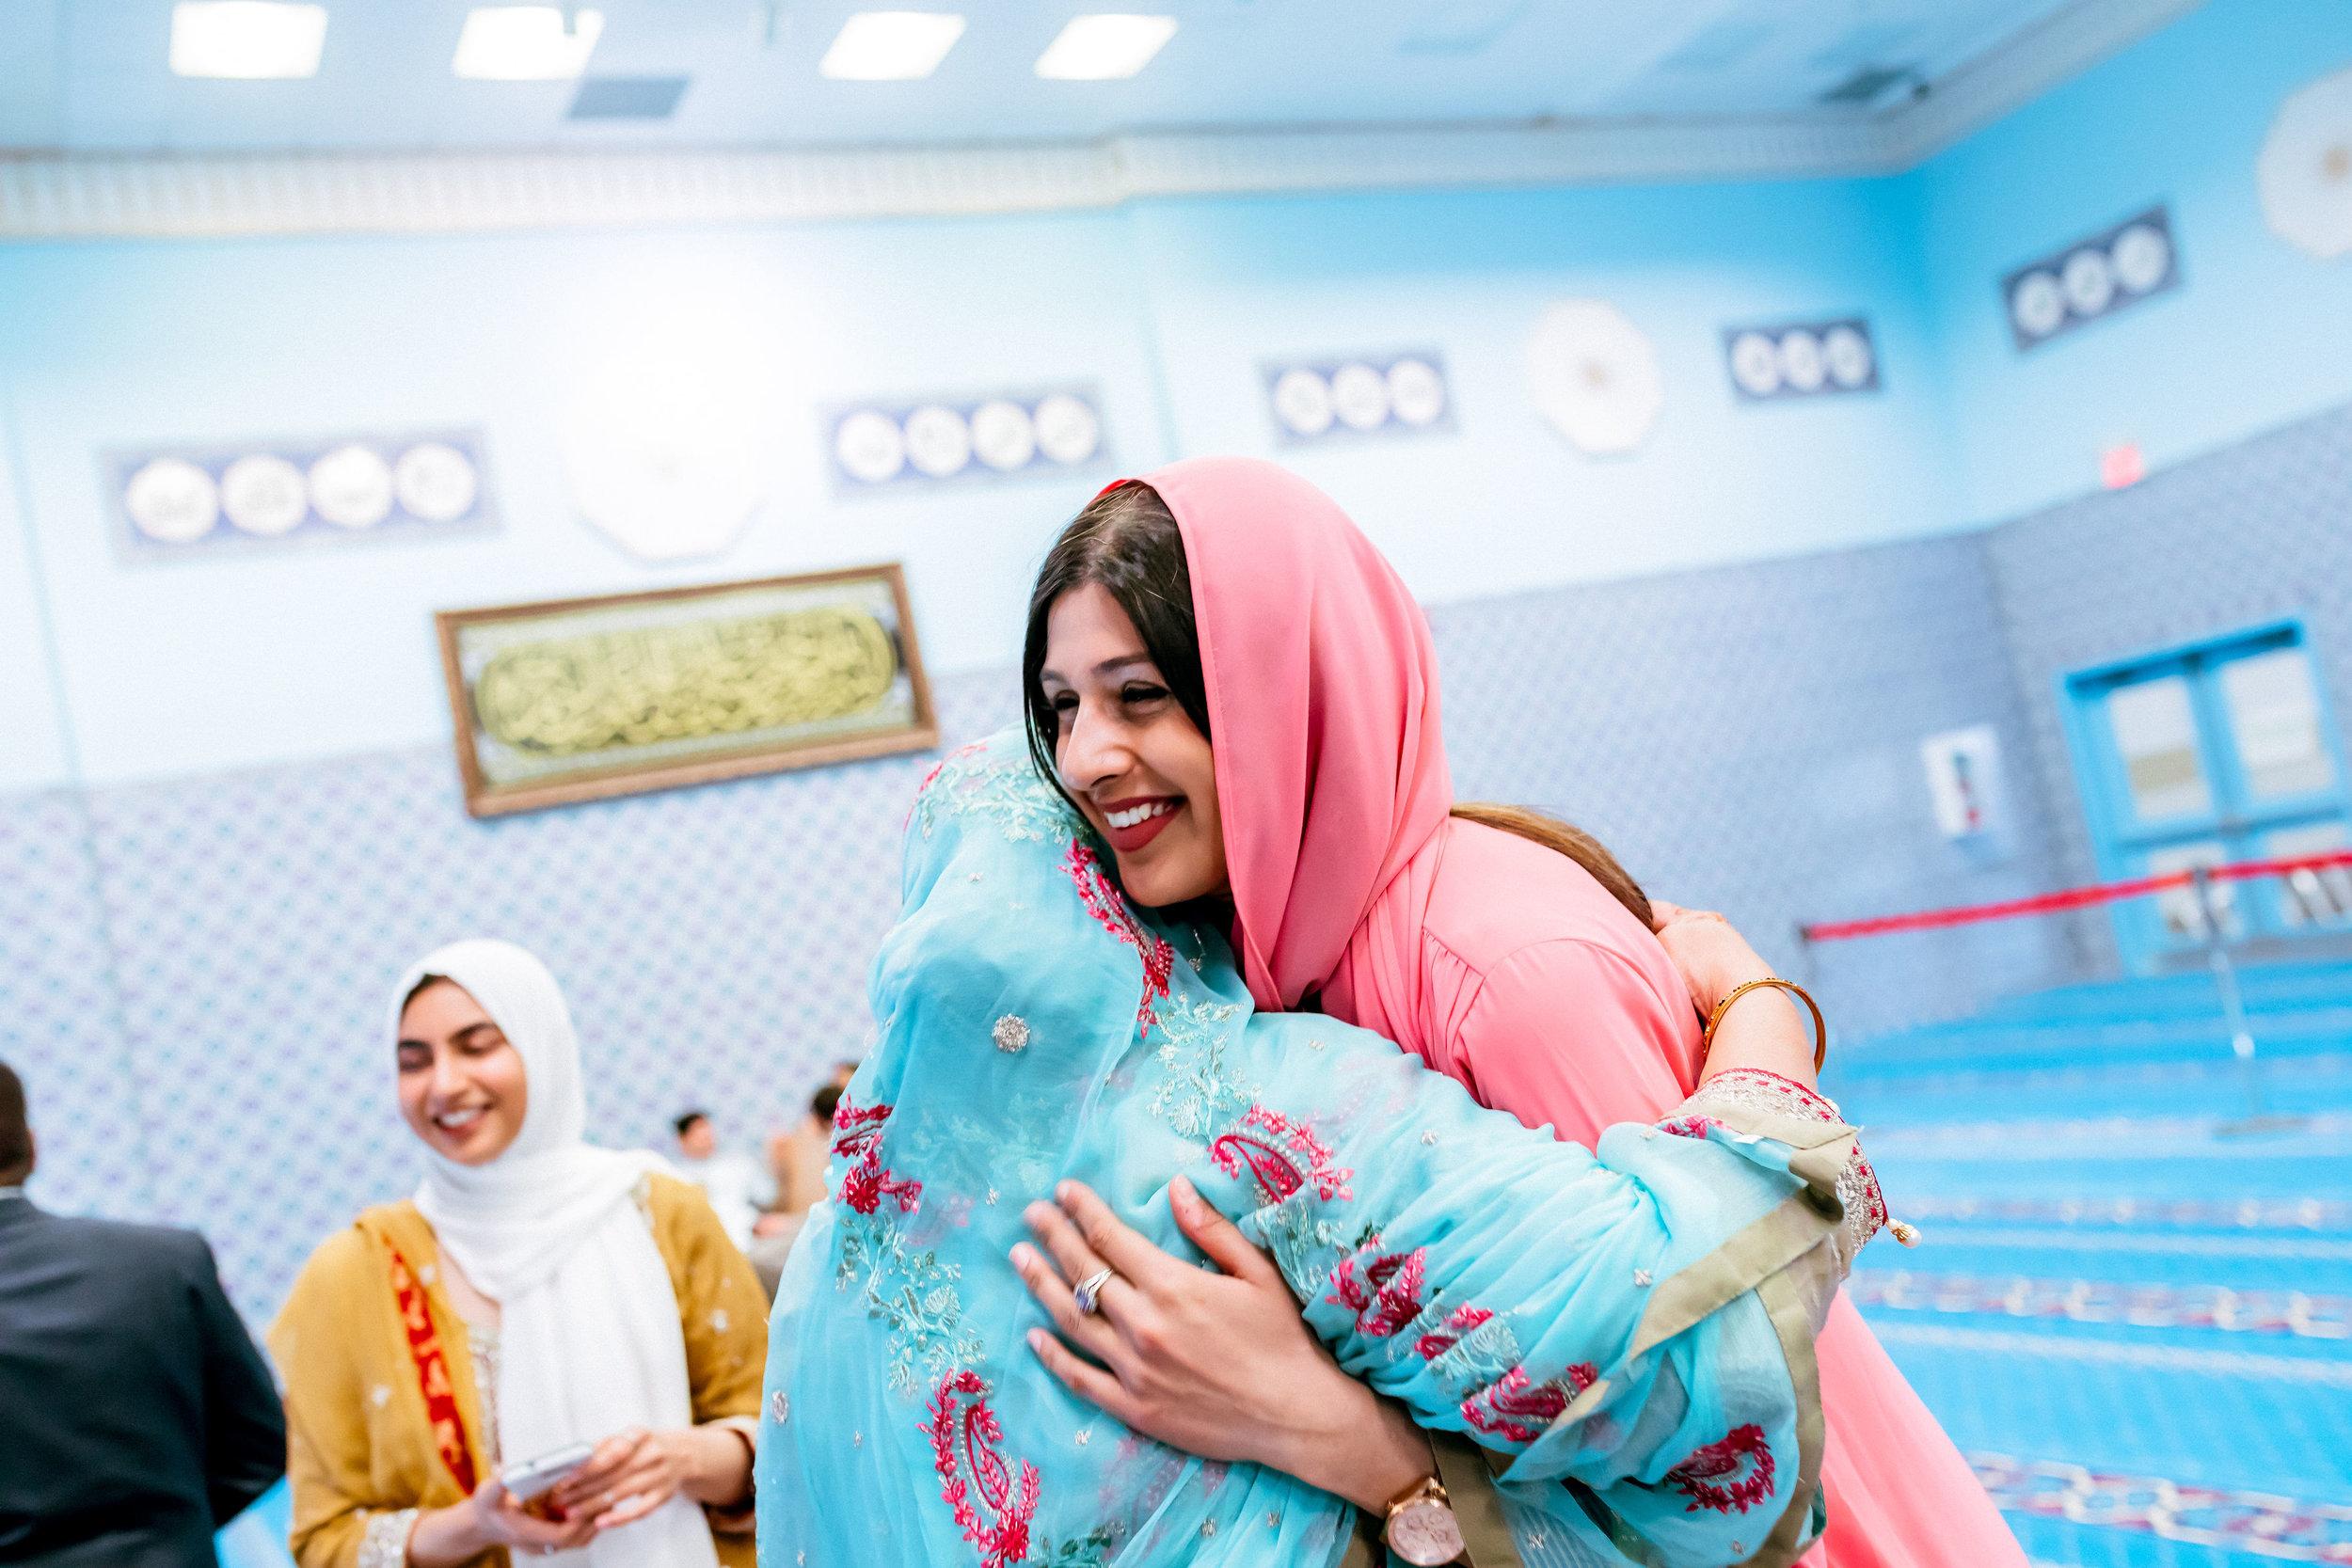 Karimah_Gheddai_Muslim_Sayeda_Khadija_Centre_Kariya_Park_GTA-Pakistani-Indian-Wedding-Engagement-Photographer-Photography_00021